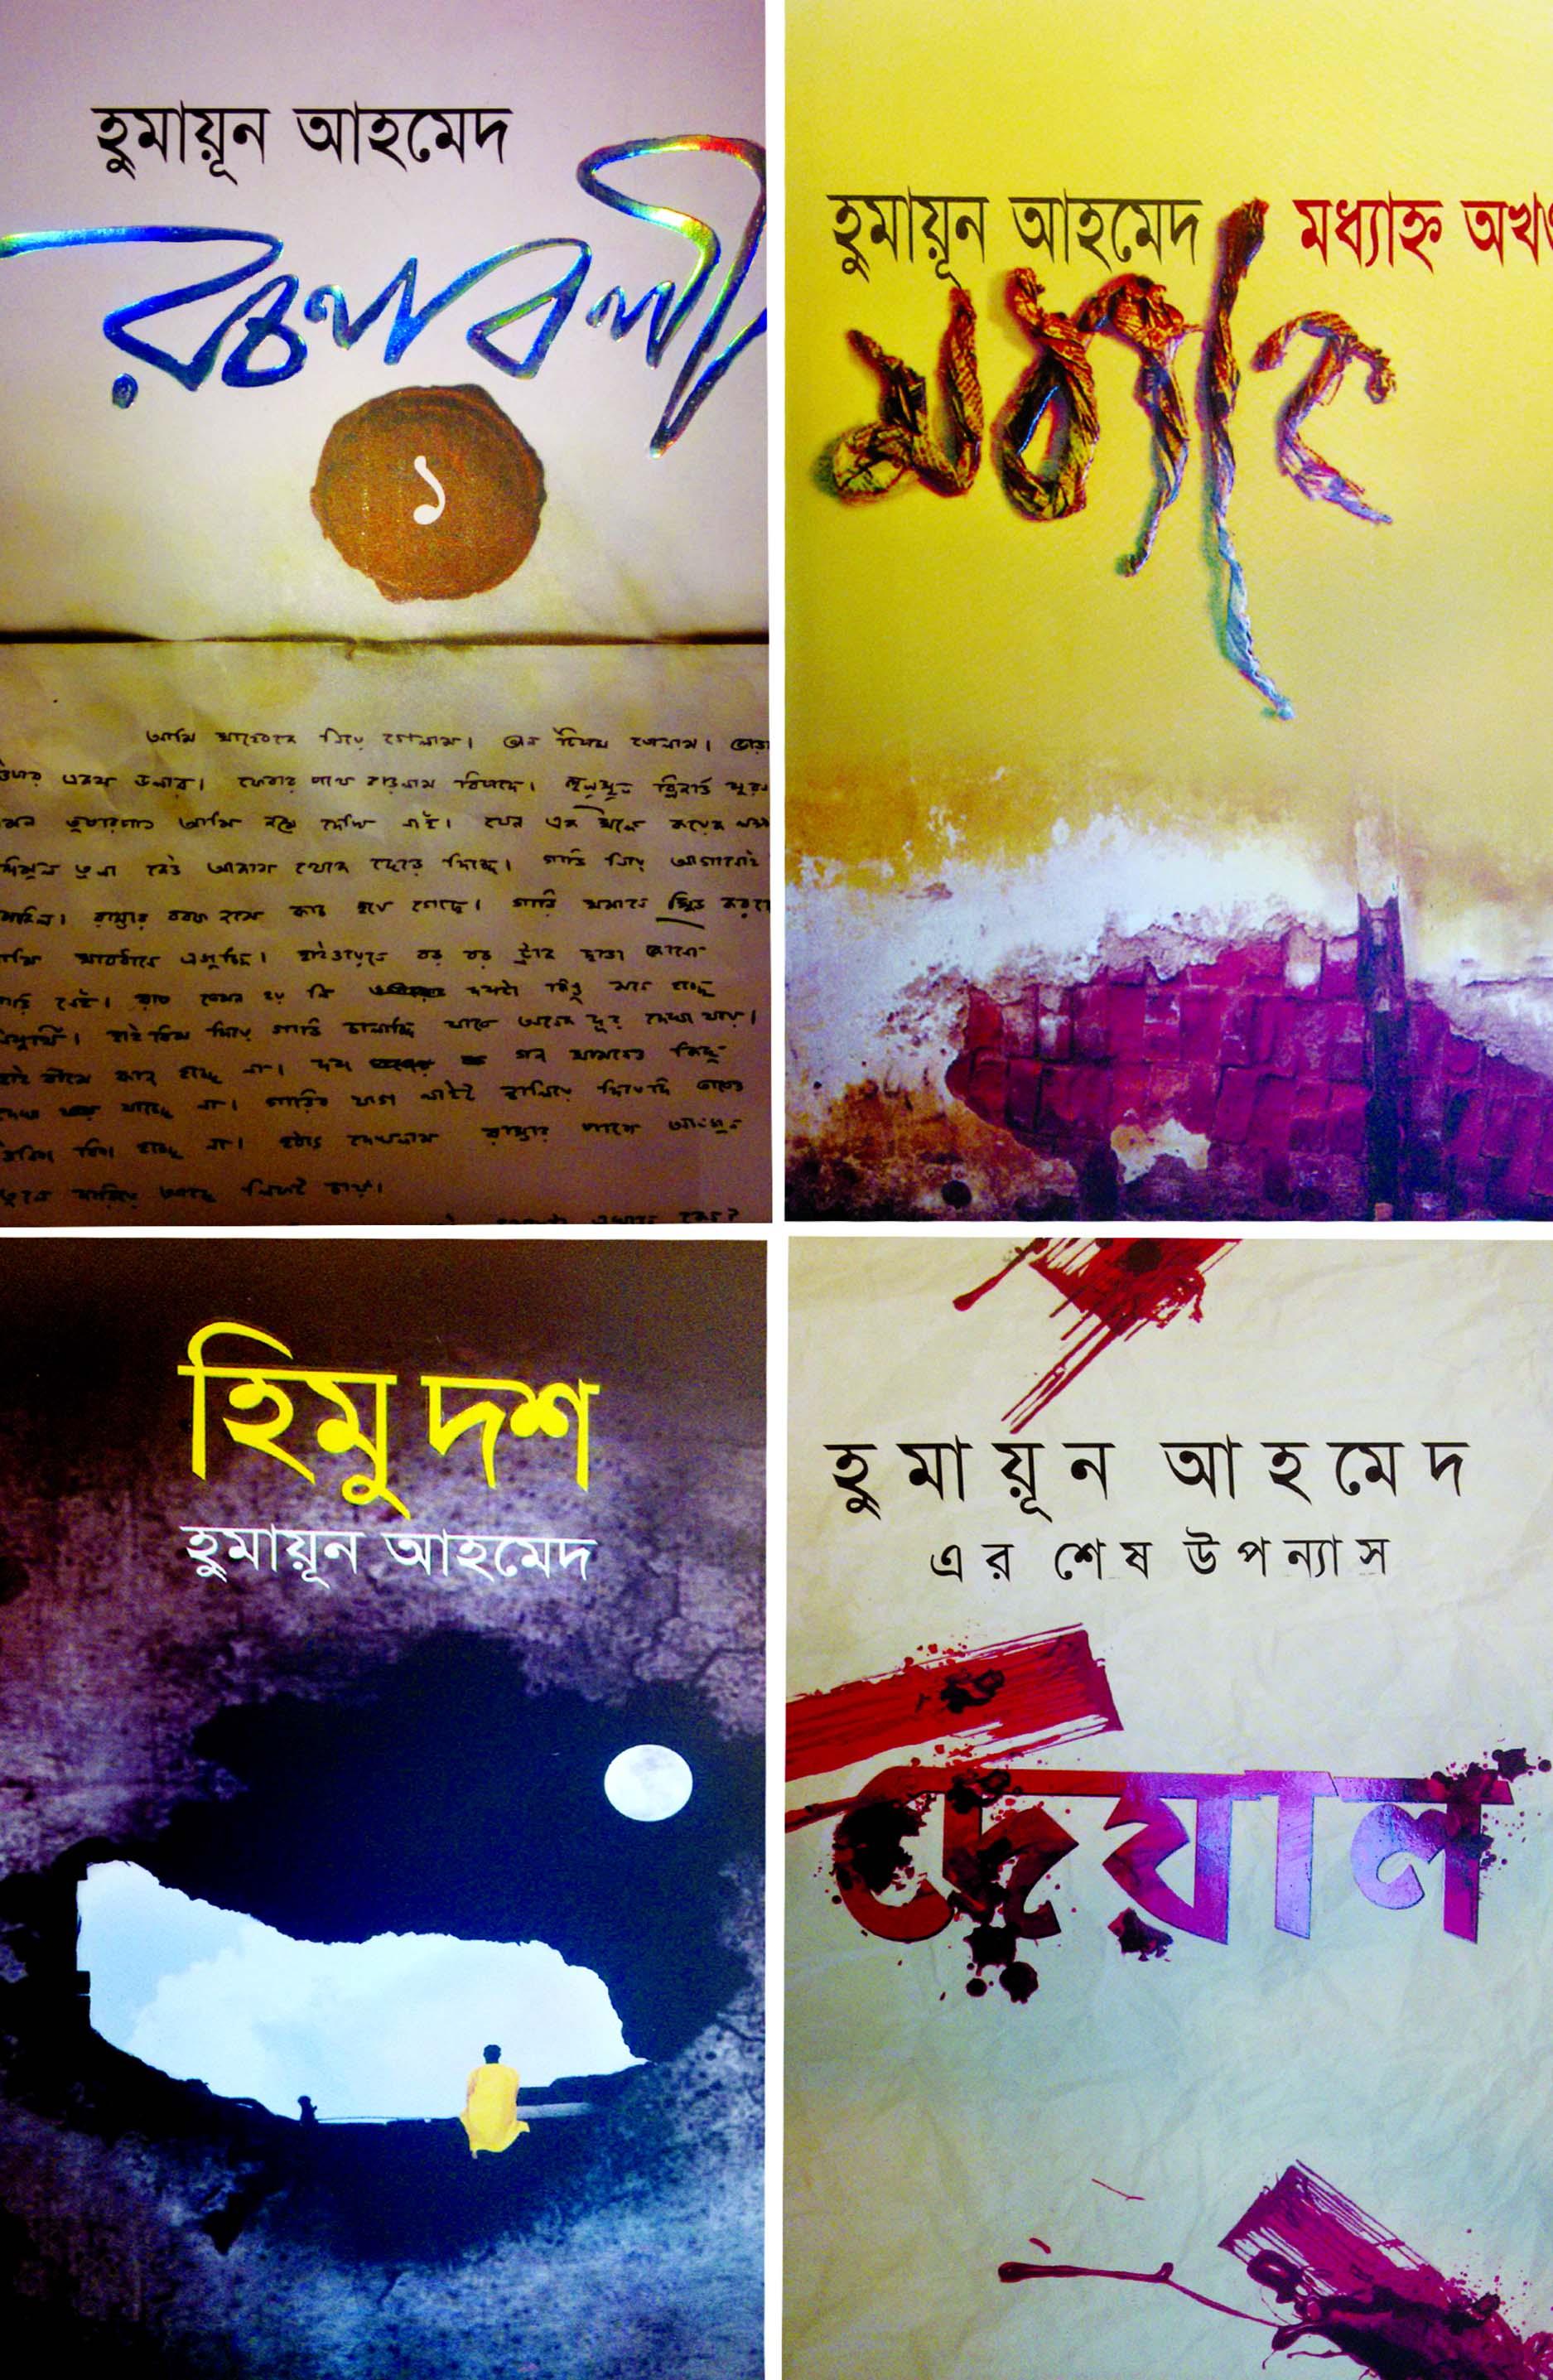 Book shonkhonil karagar